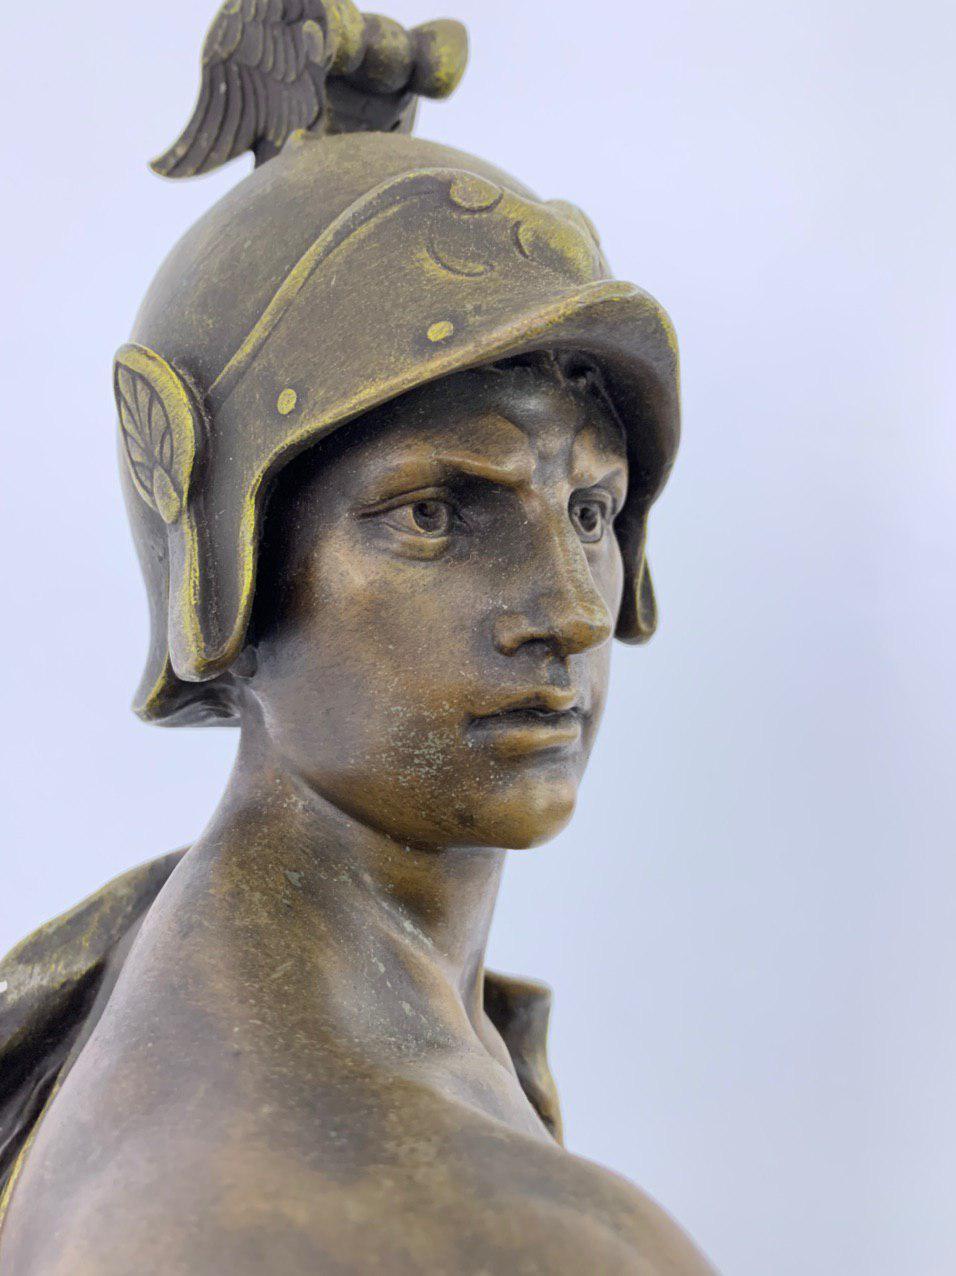 Антикварная статуя из шпиатра